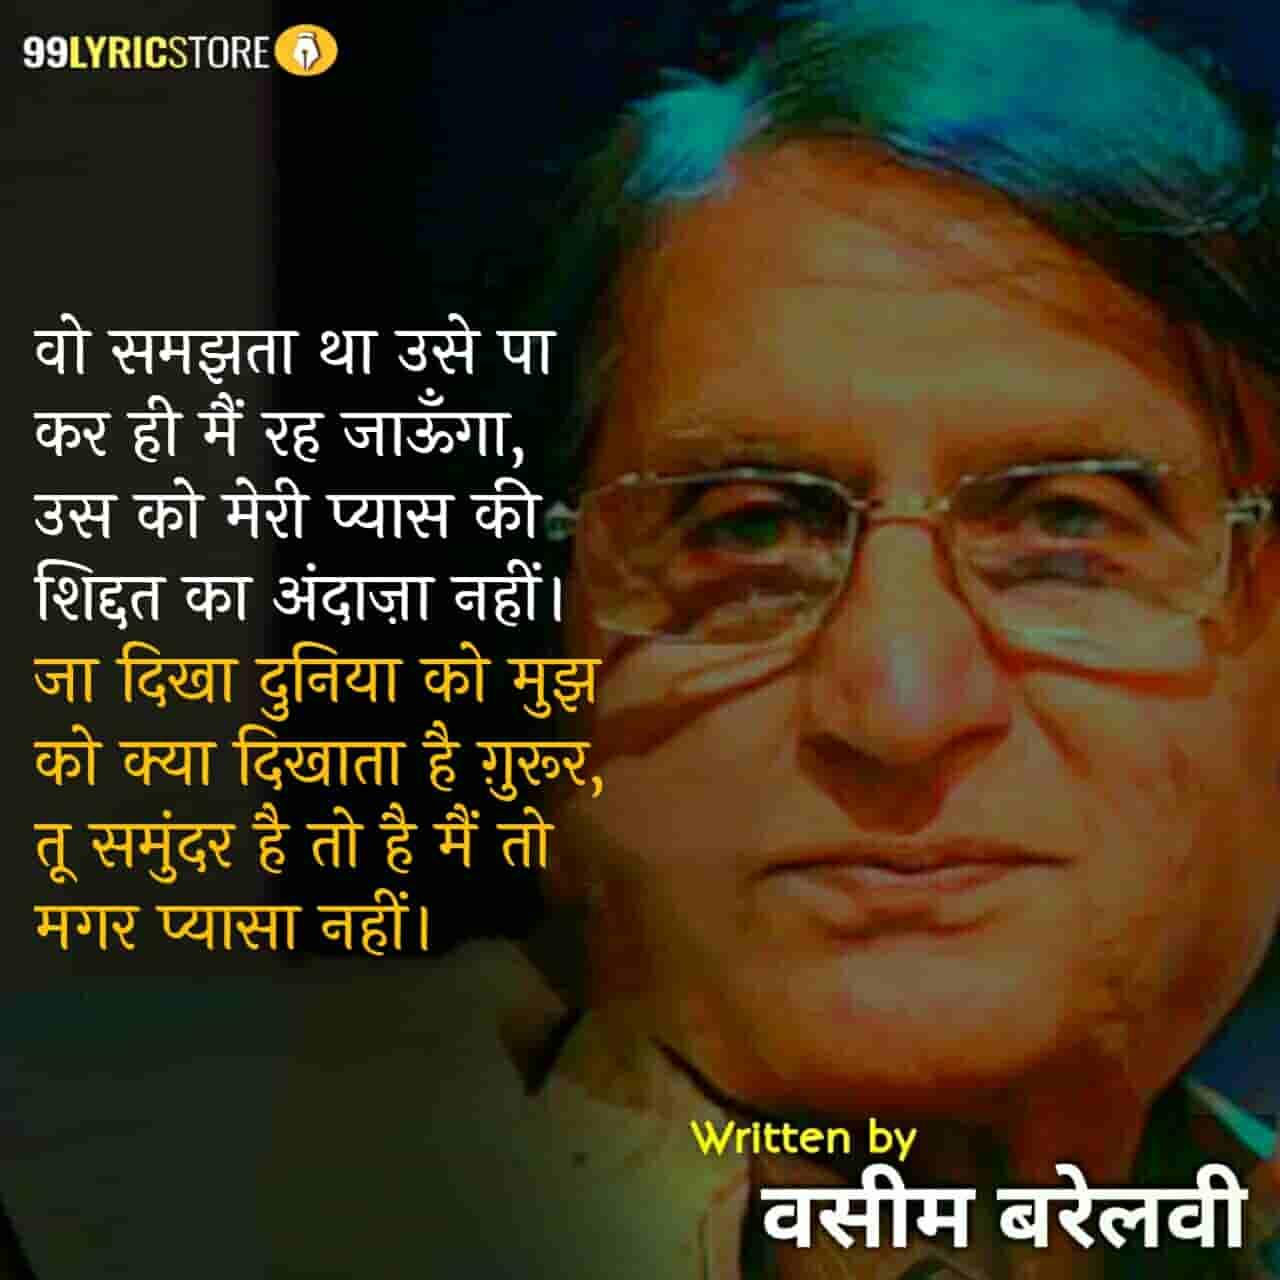 This beautiful Ghazal 'Khul Ke Milne Ka Saleeka Aapko Aata Nahi' has written by Waseem Barelvi.